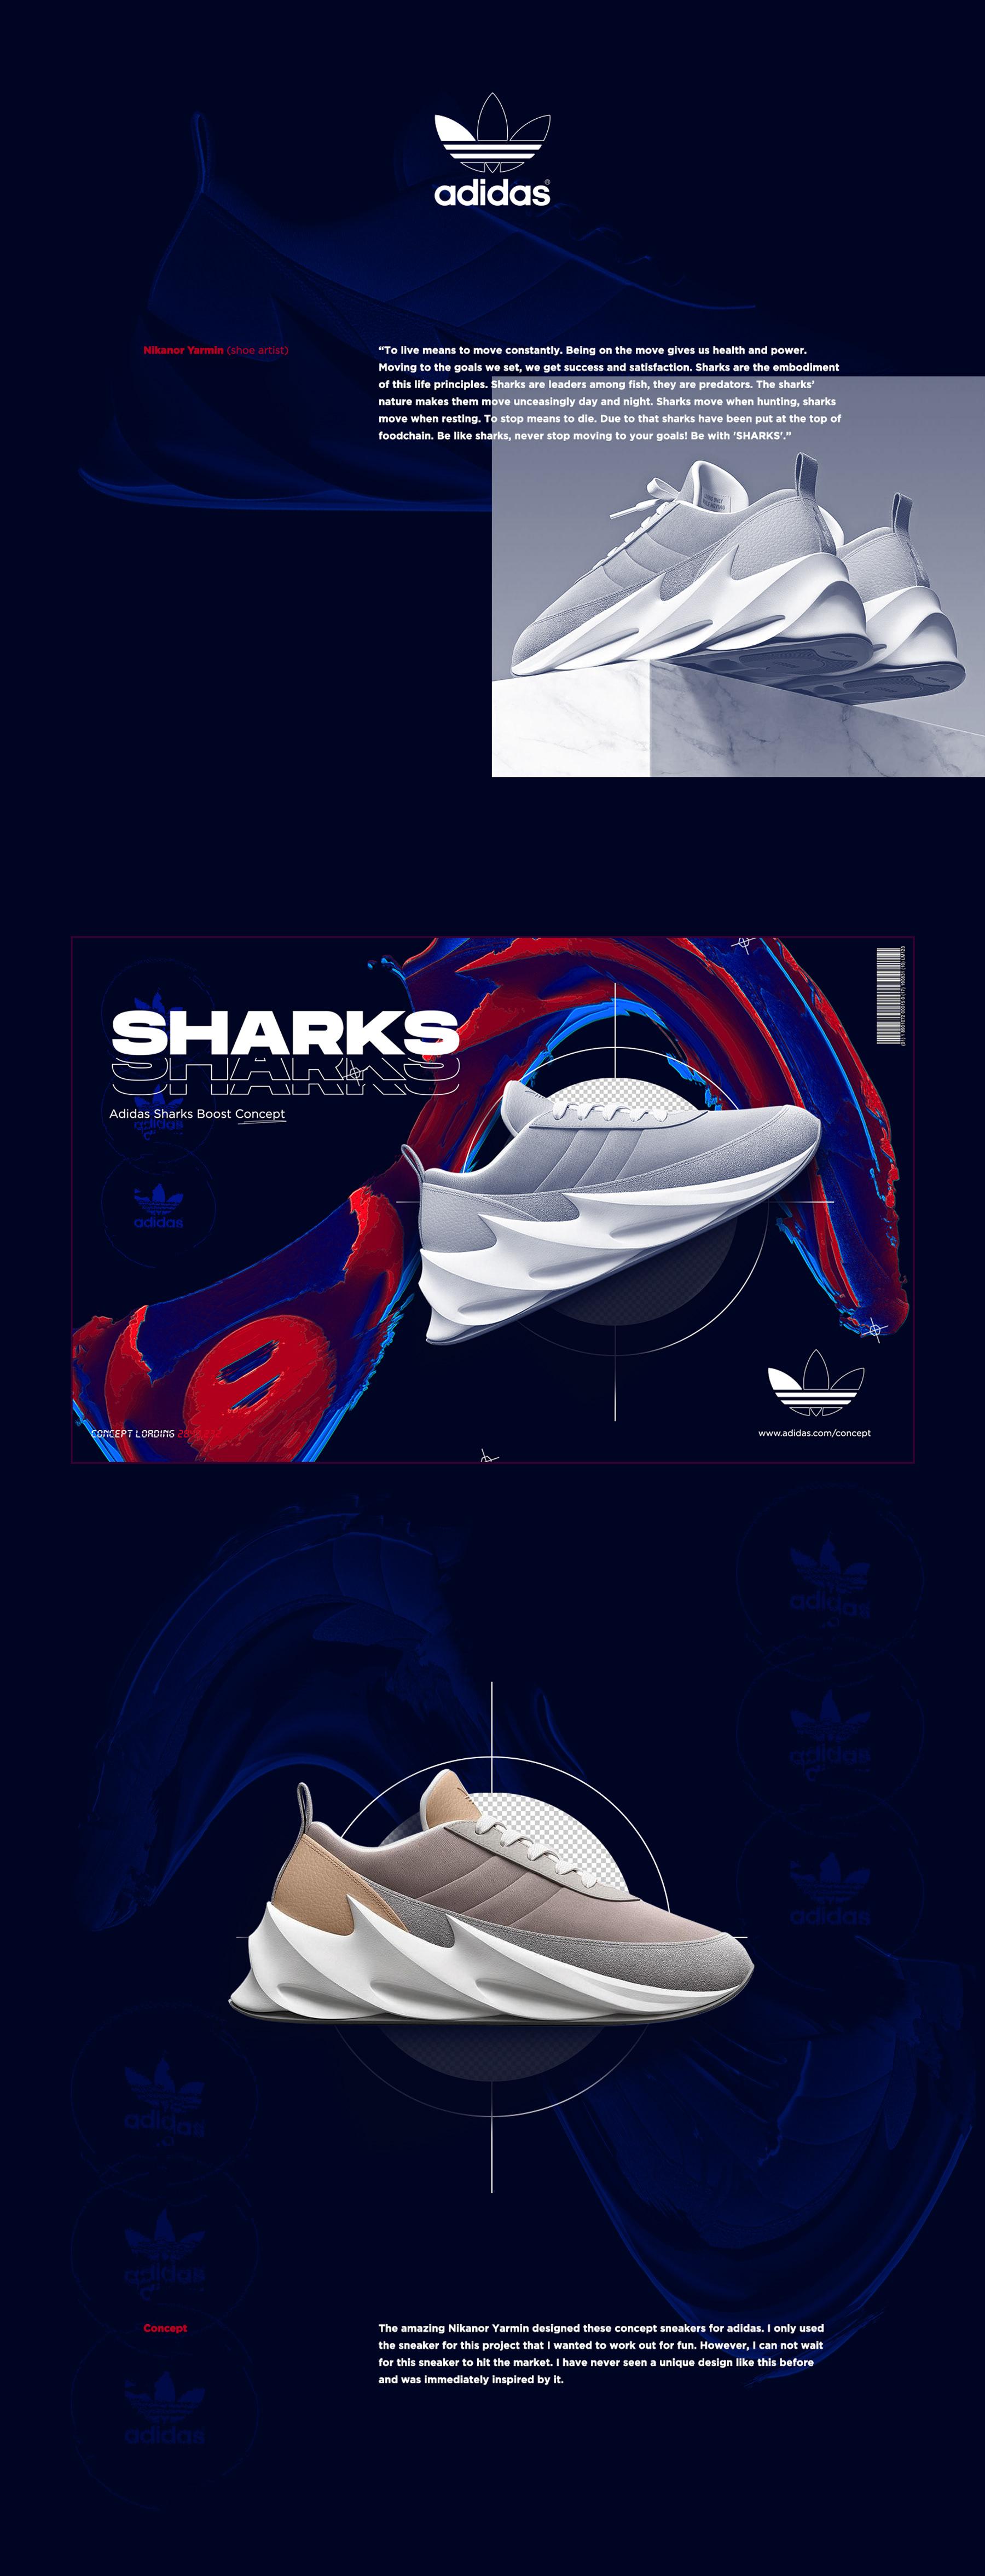 Luna Señor rumor  Adidas Sharks Boost Concept on Behance